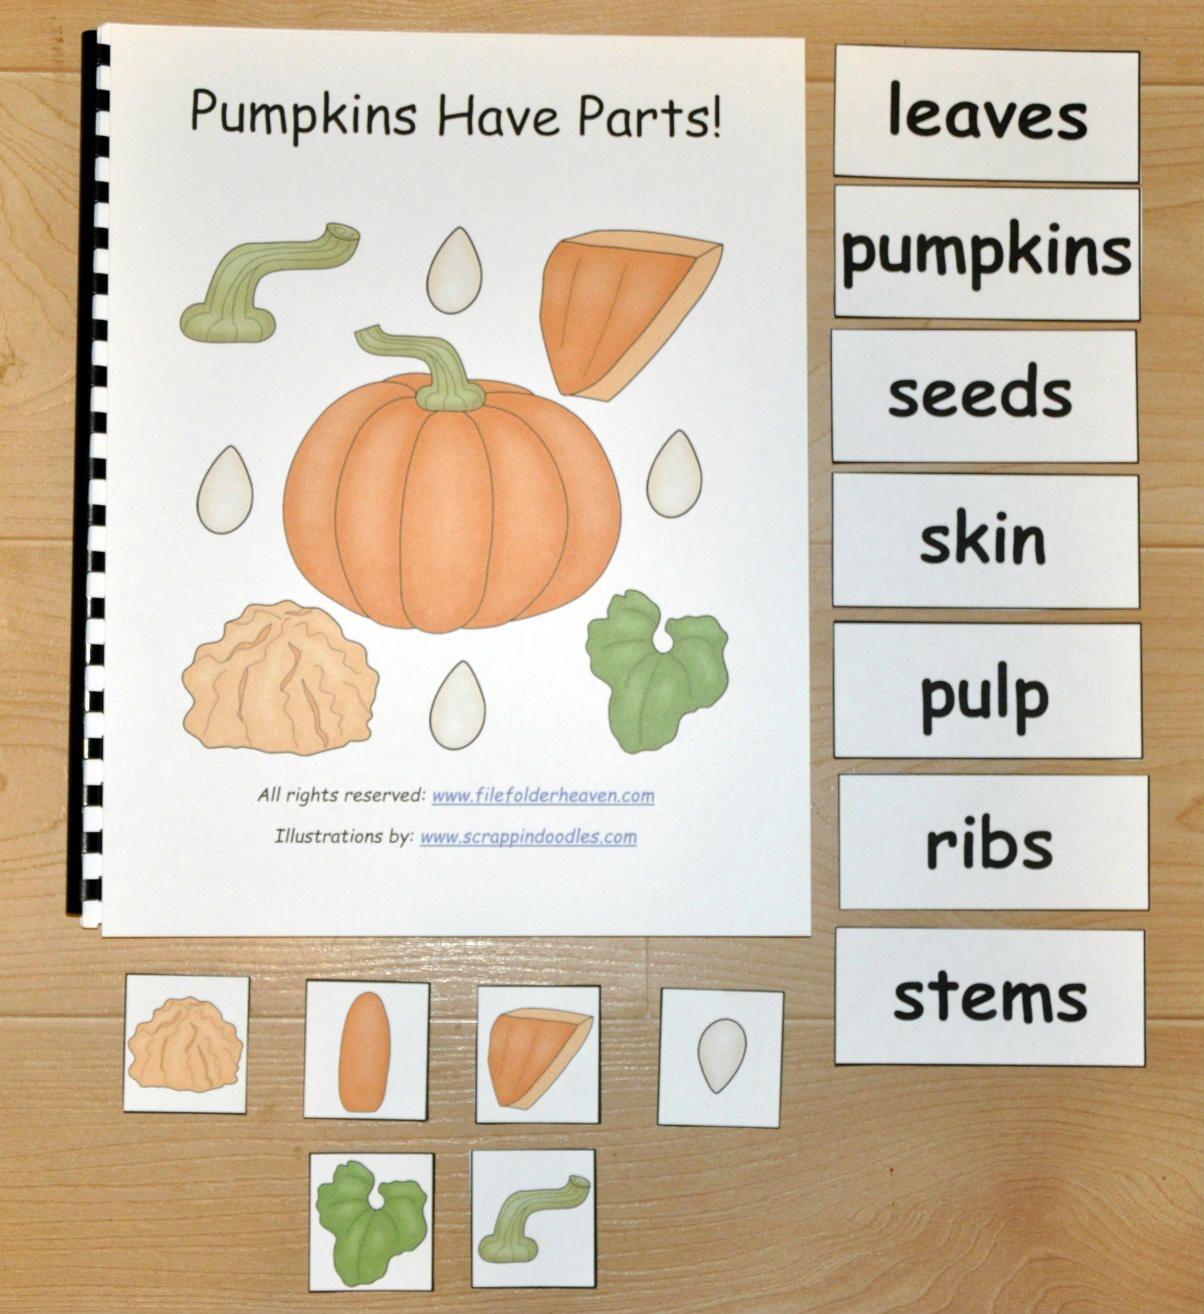 Pumpkins Have Parts Explore Pumpkin Anatomy With Your